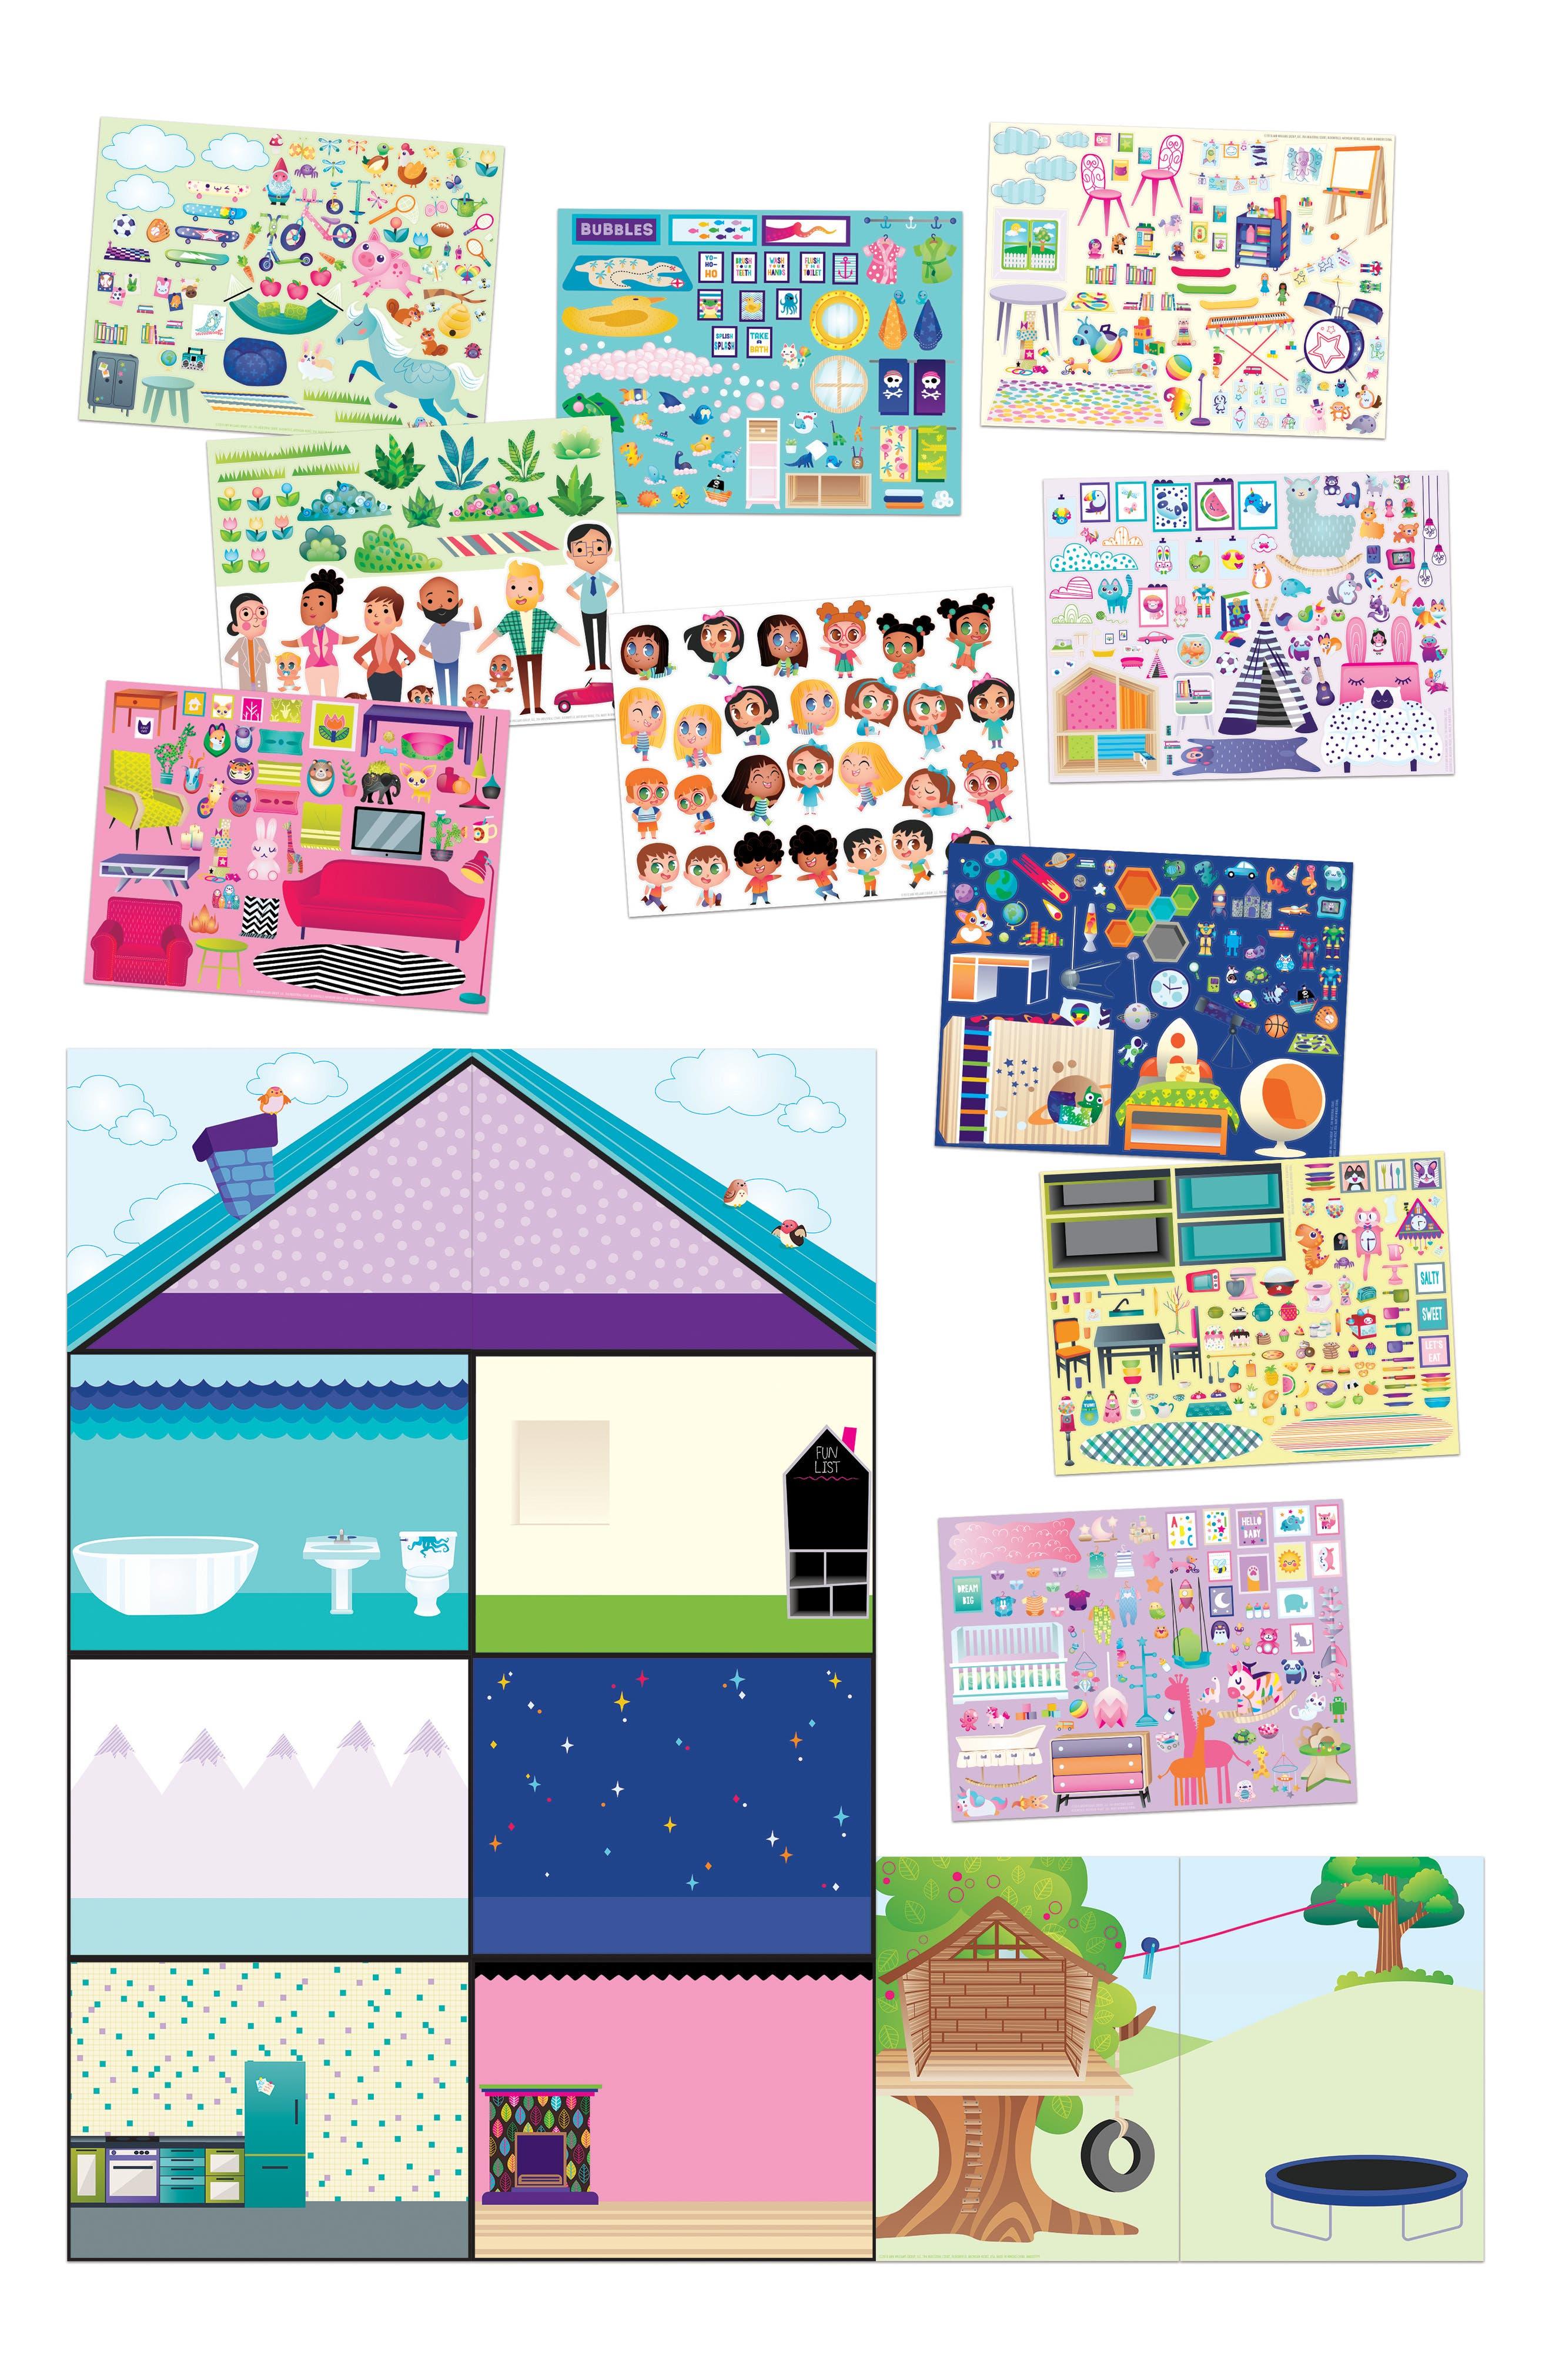 Jr. Wall Sticker Playhouse Set,                             Alternate thumbnail 3, color,                             960